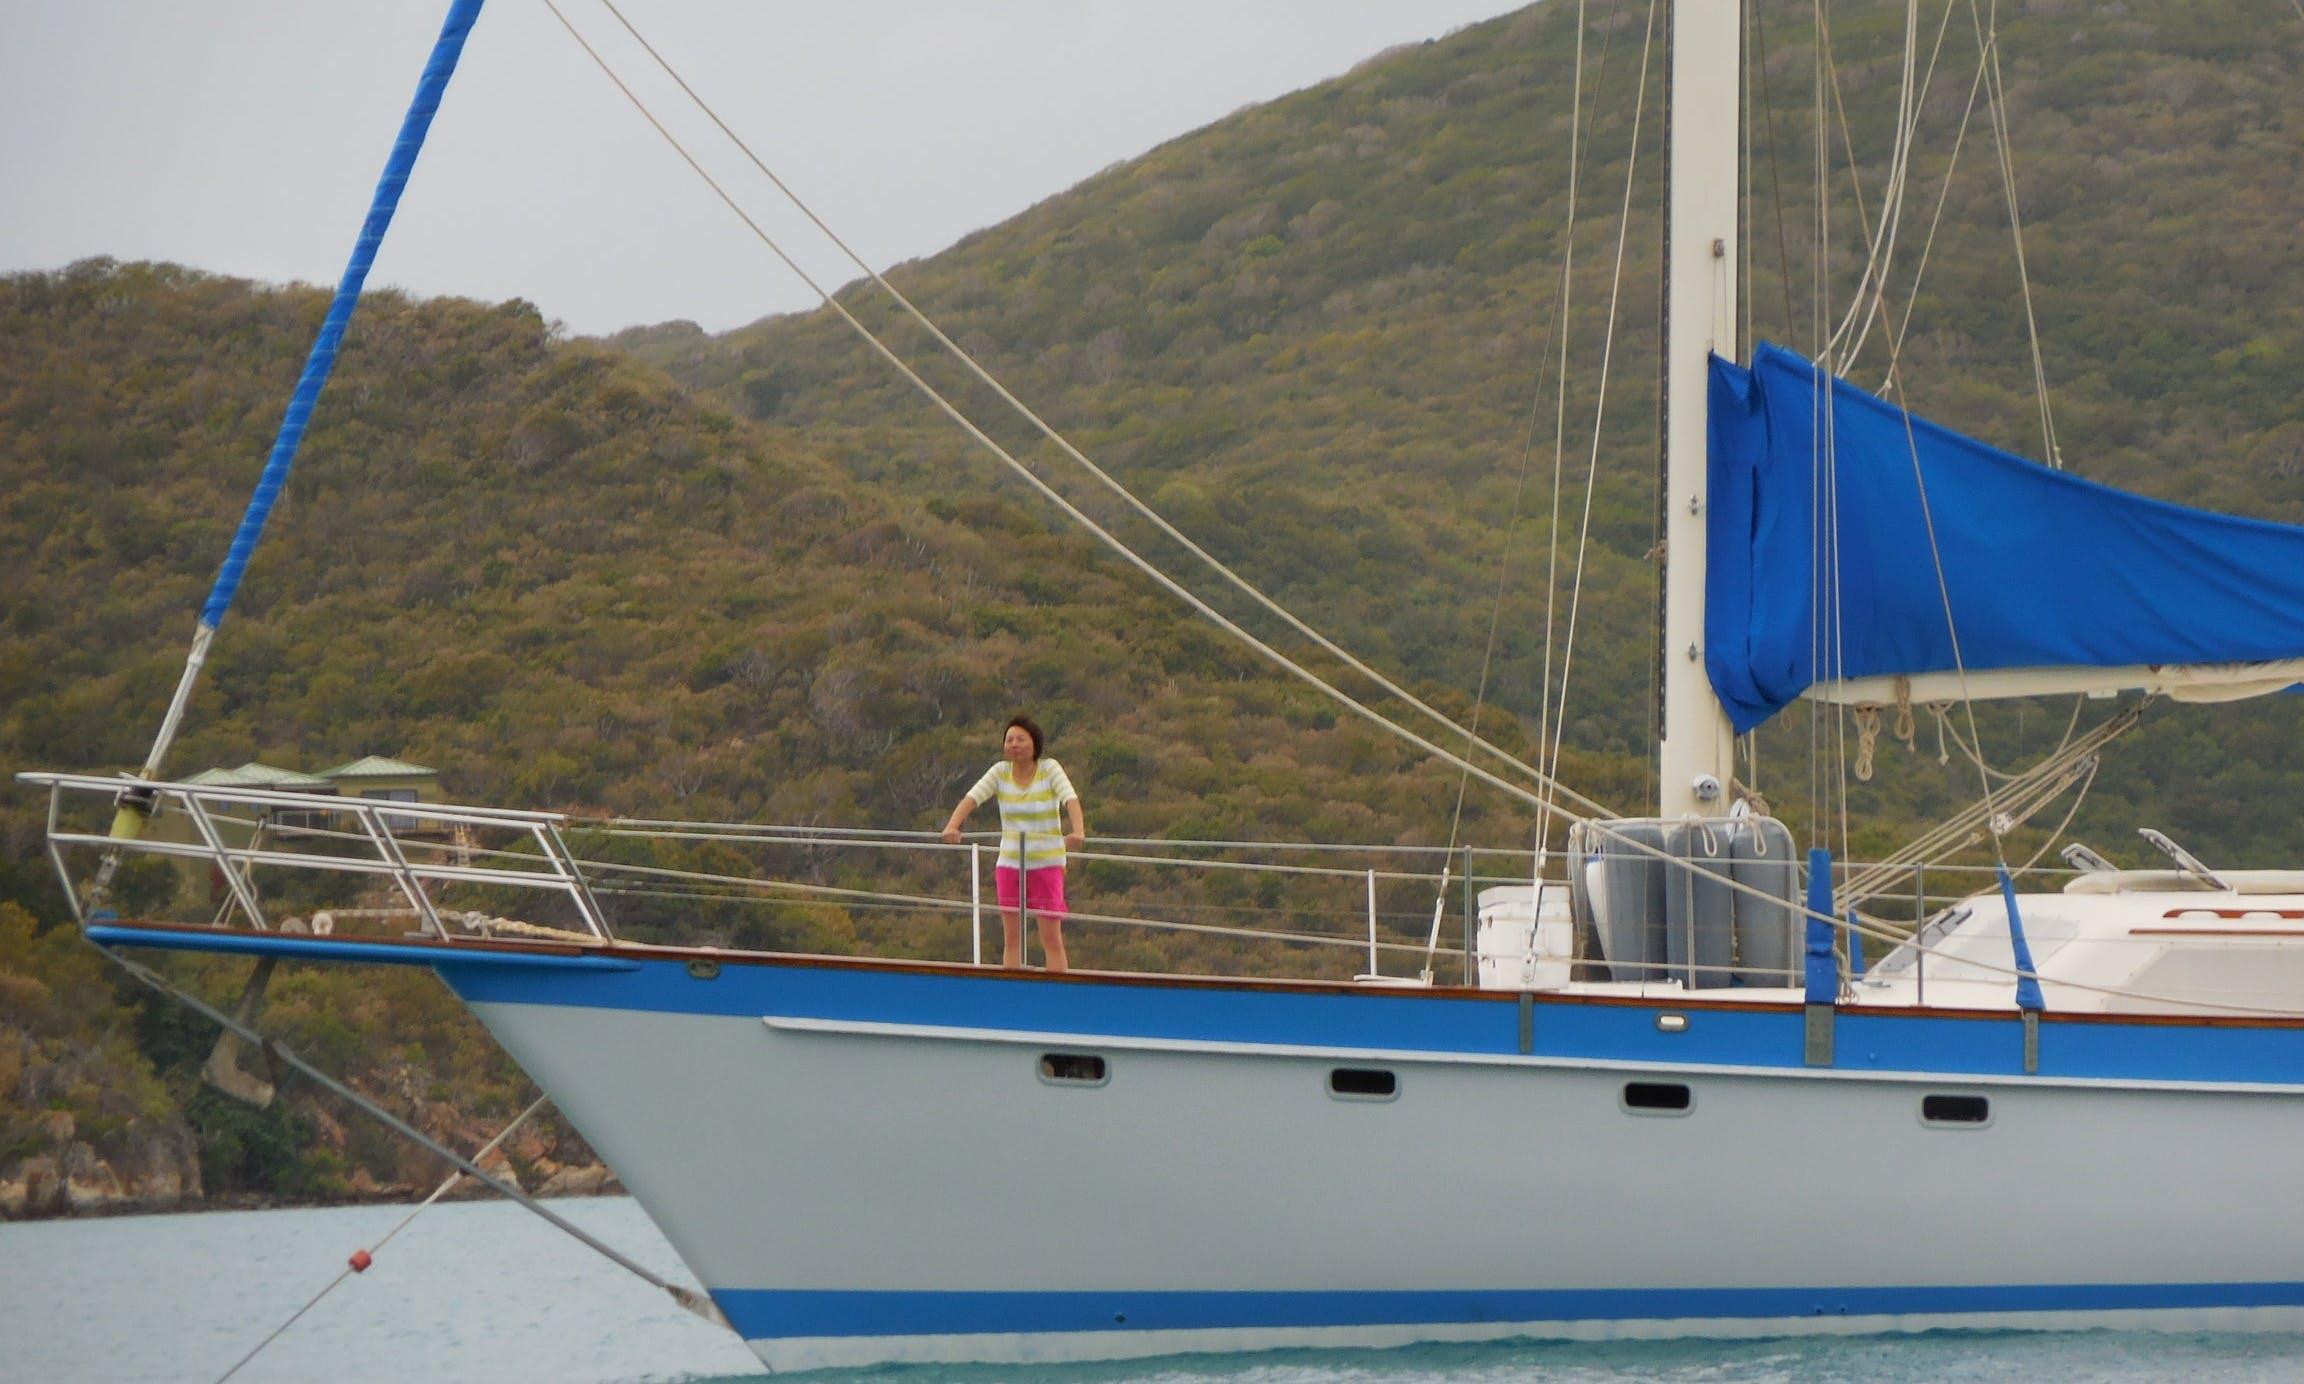 72 ft Cruising Monohull Charter for 4 Peopl in St. Thomas, US Virgin Islands